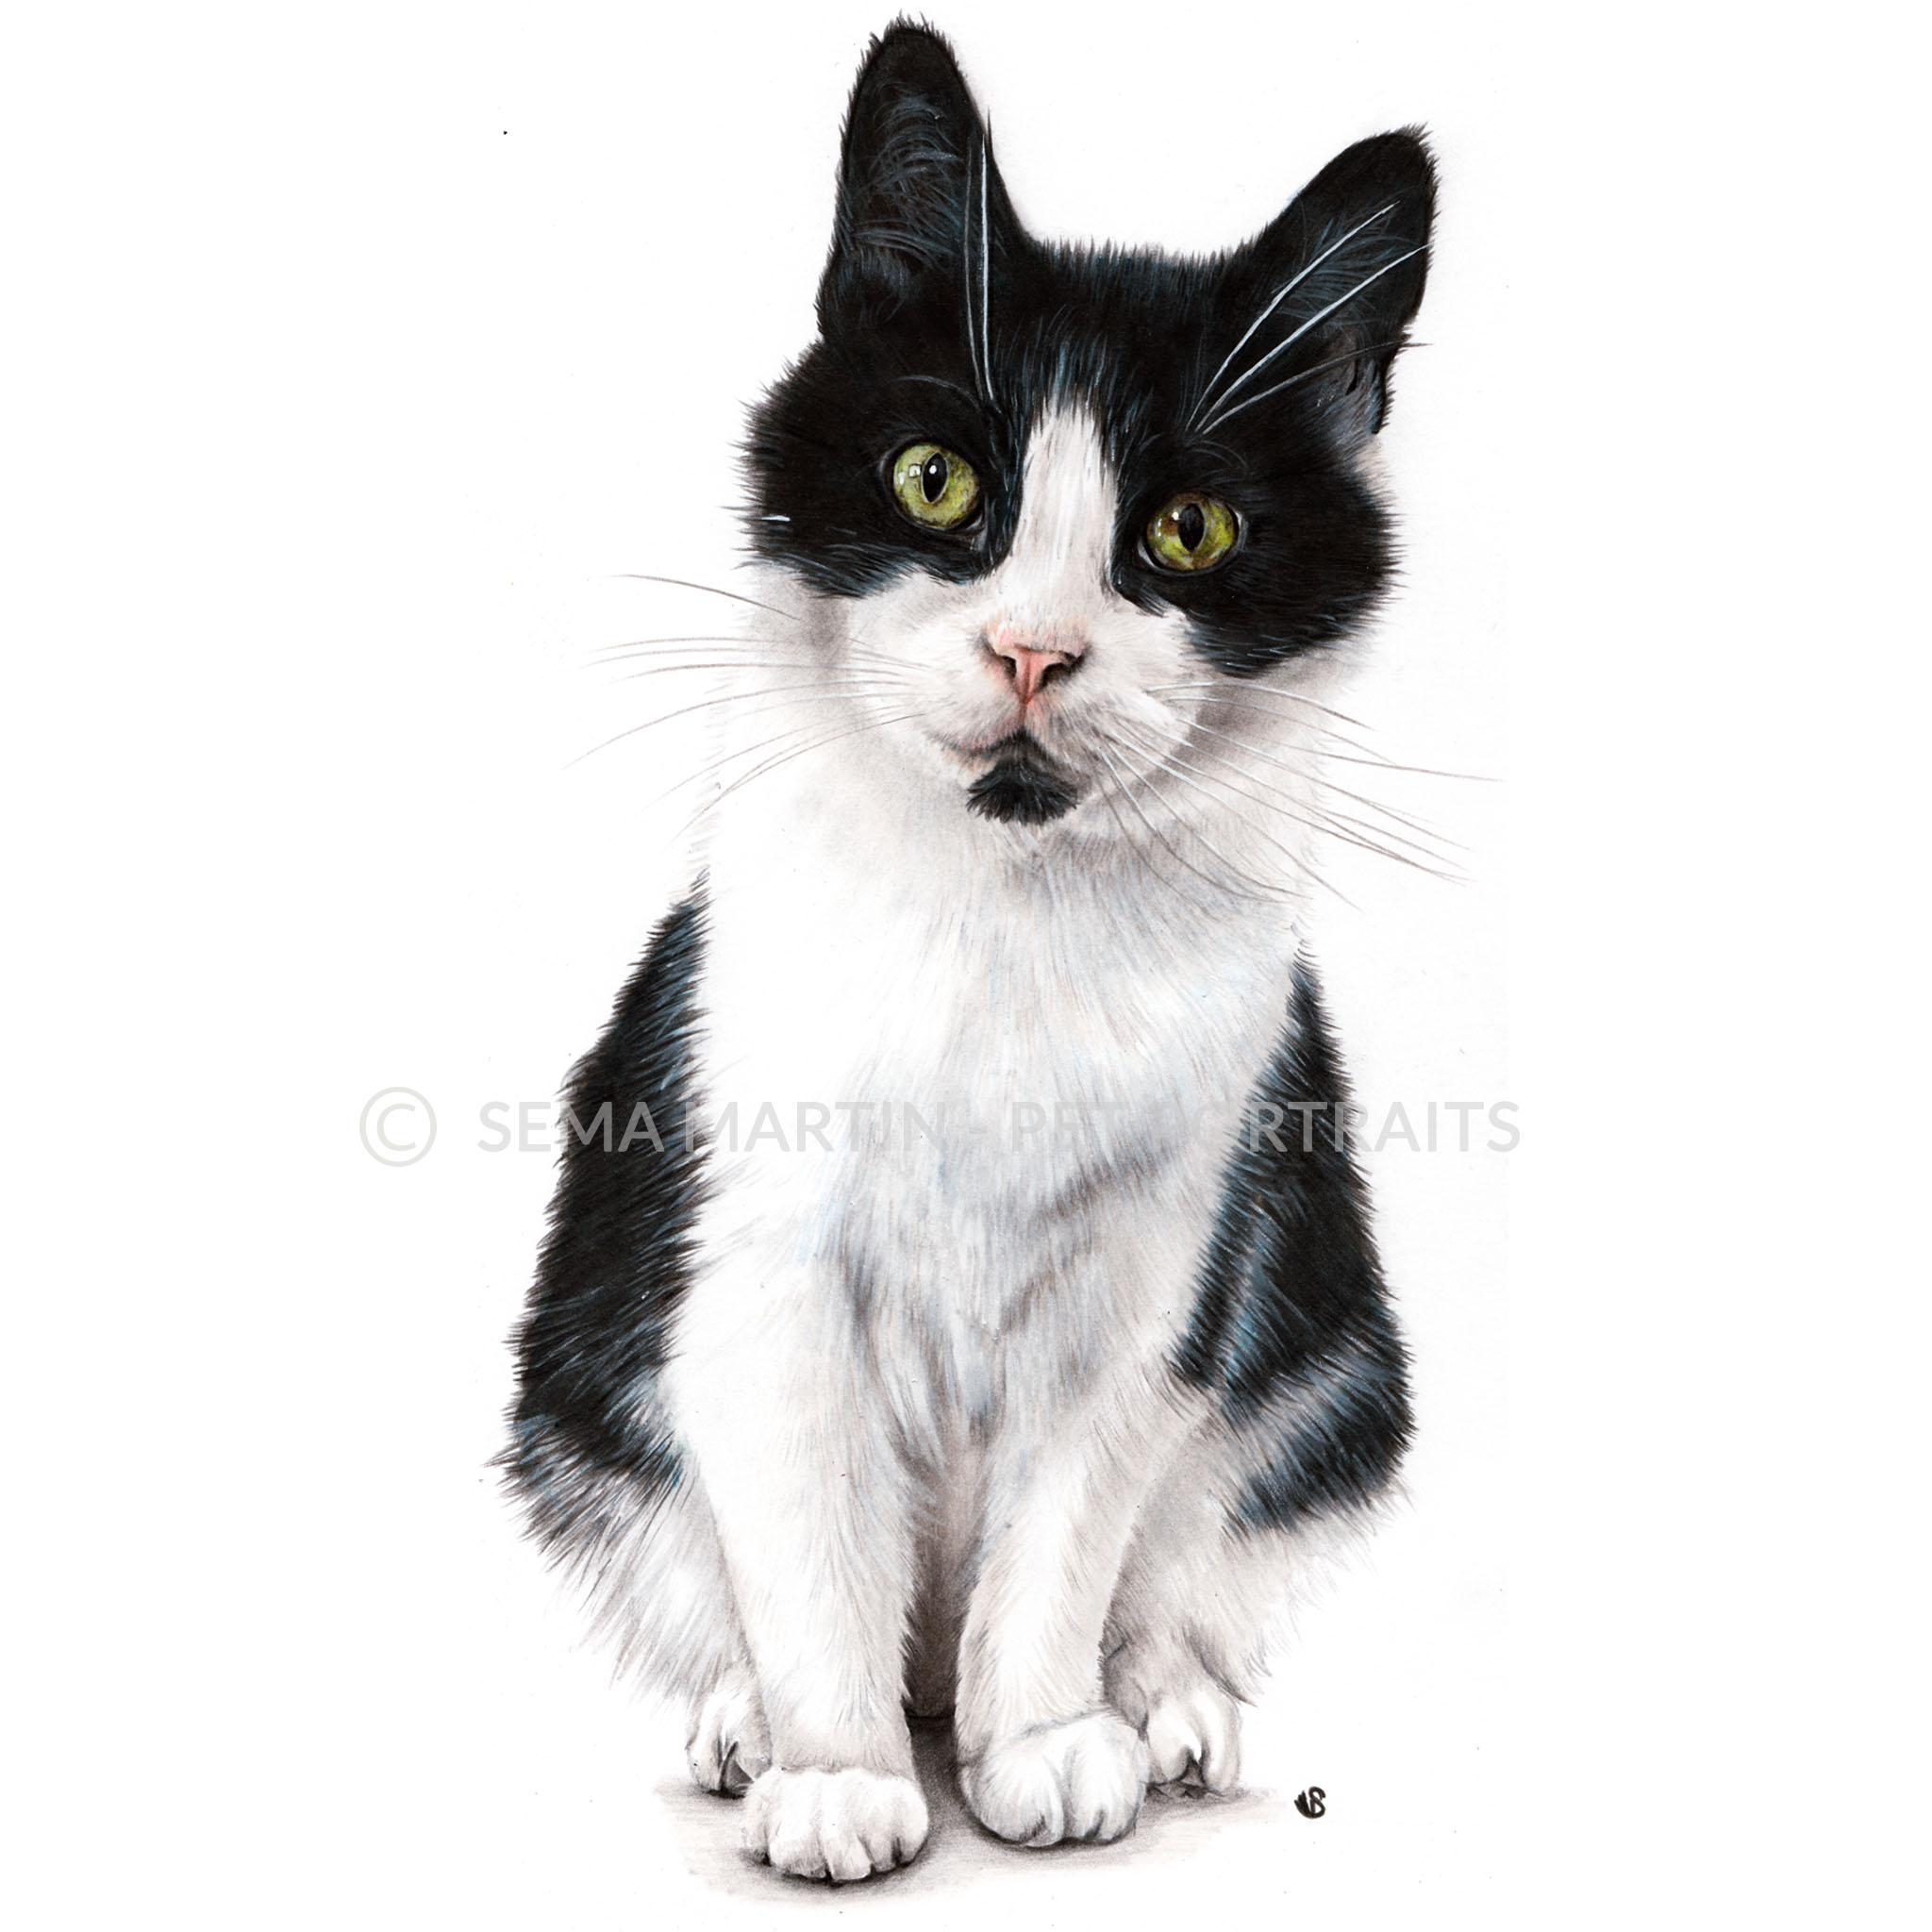 'Poppet' - UK, A4, black and white cat portrait